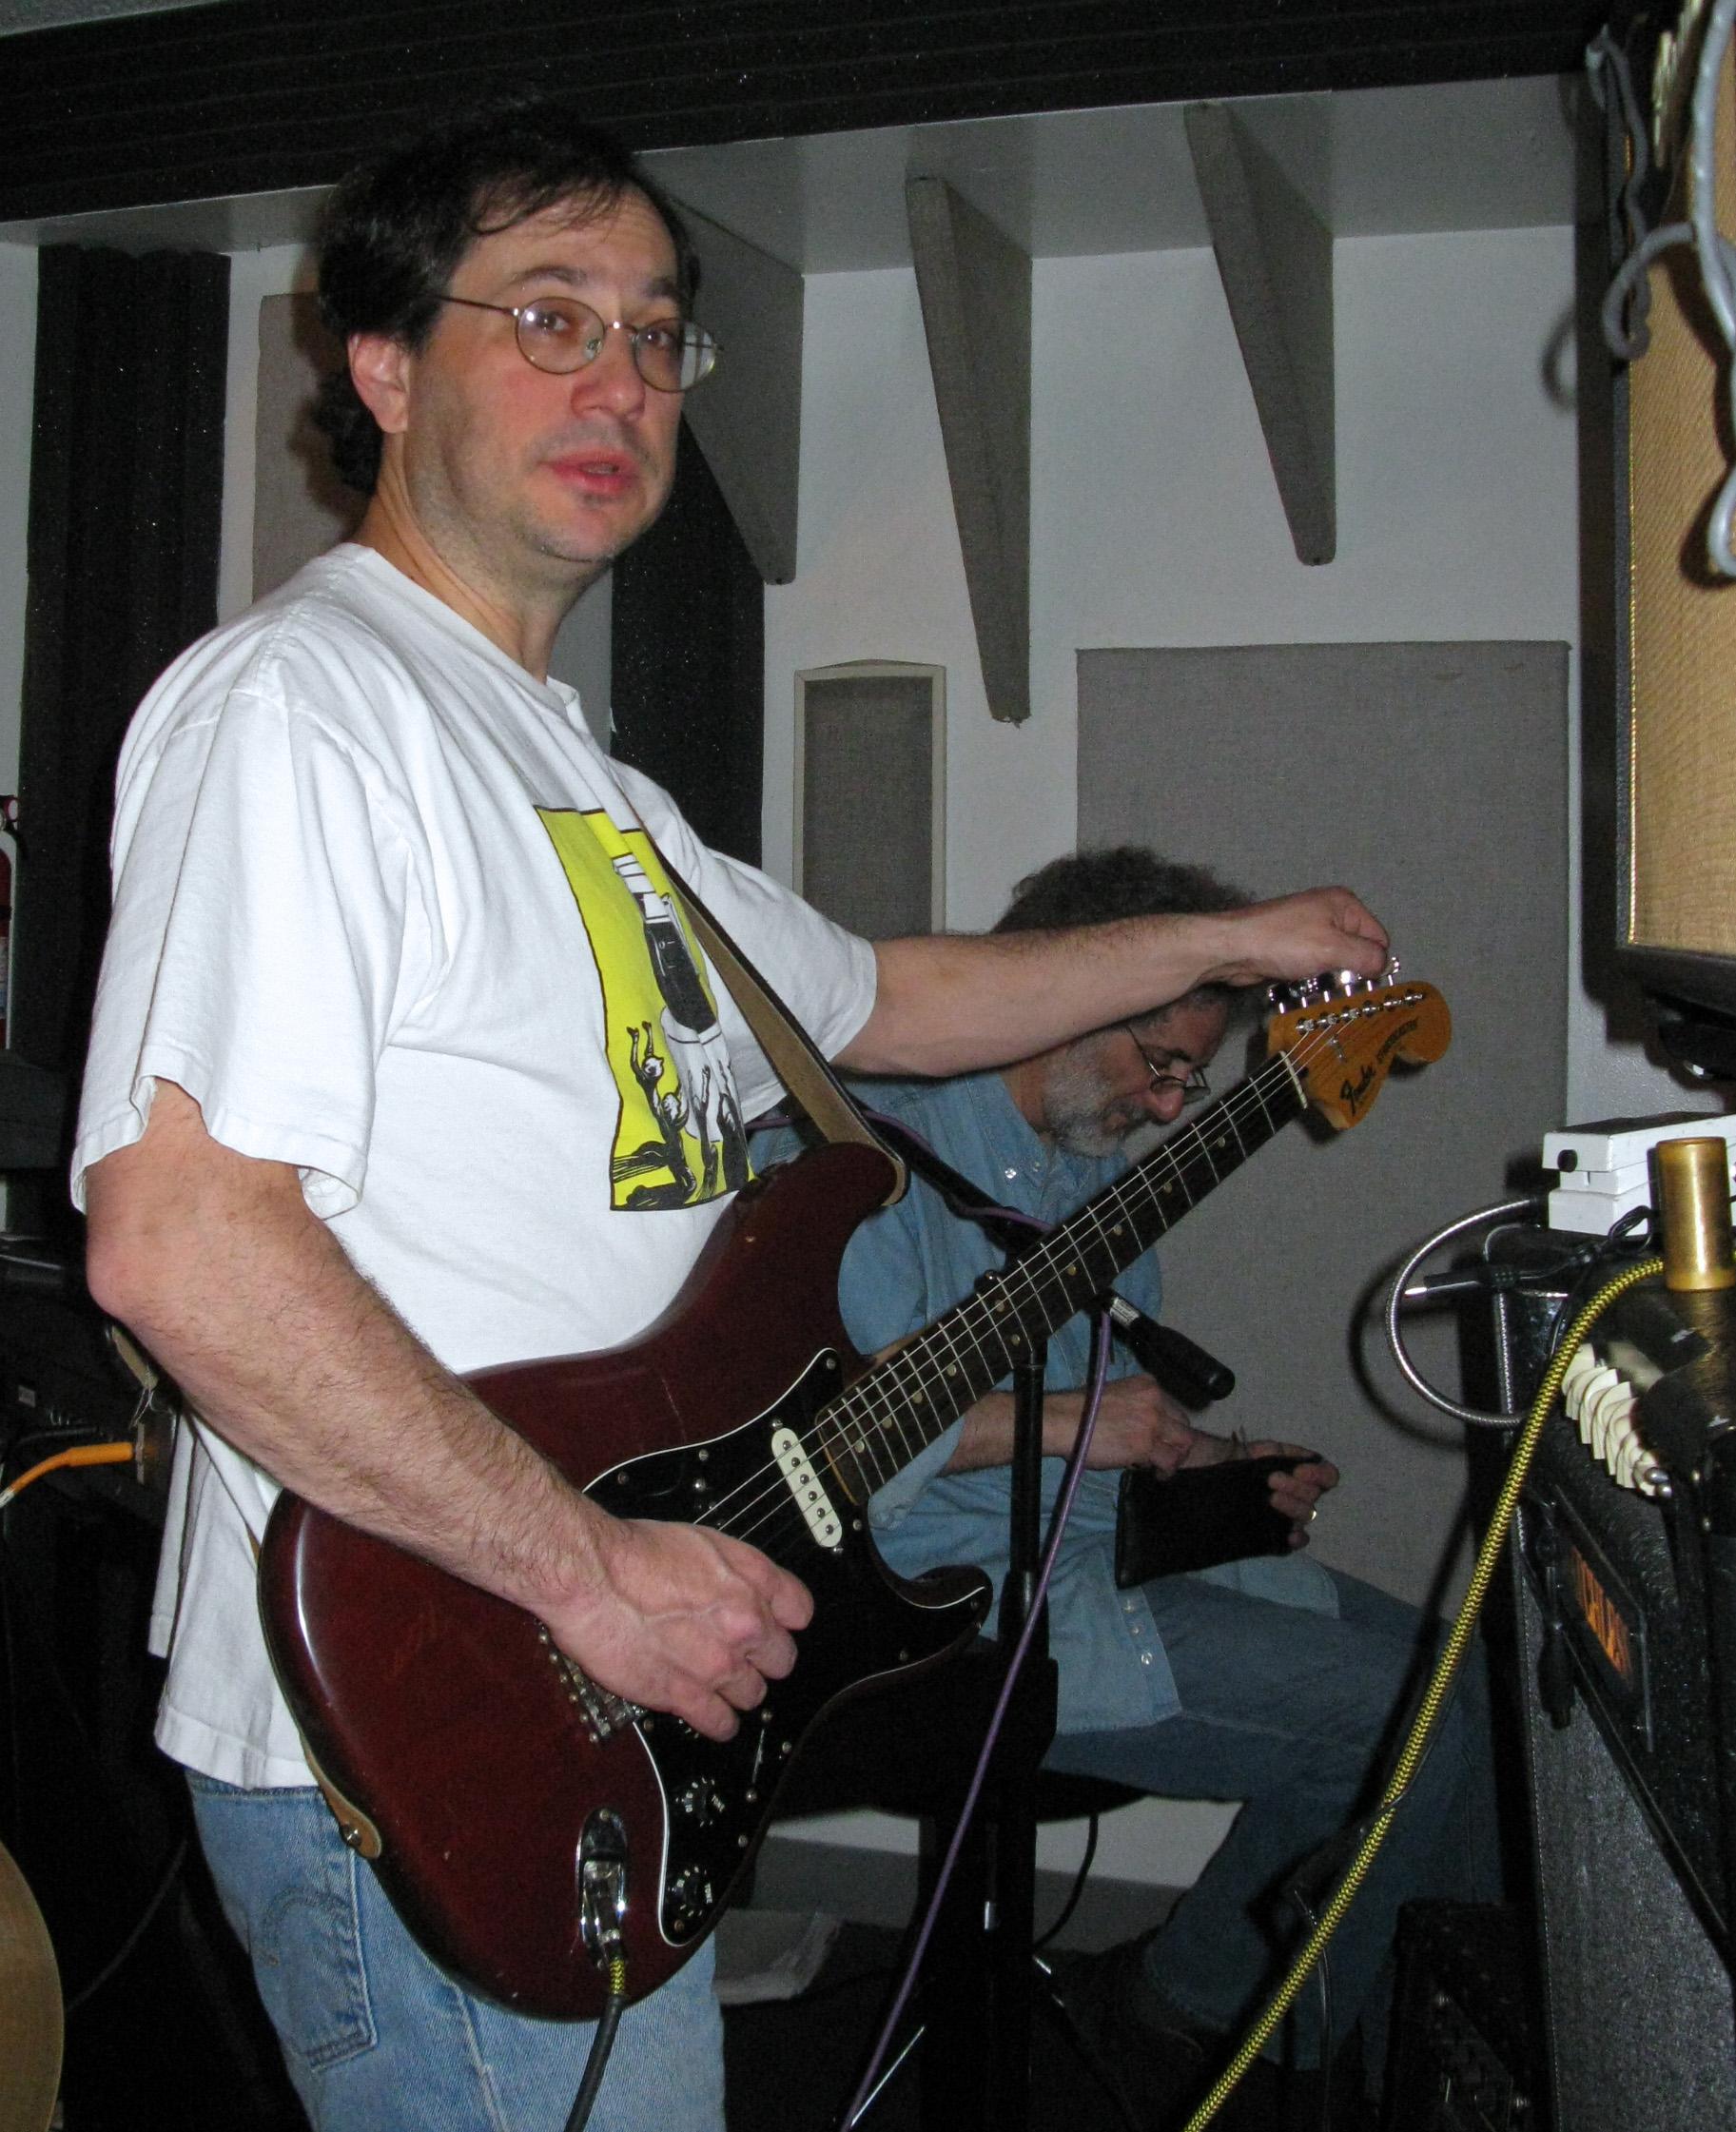 lg-2009-04-14